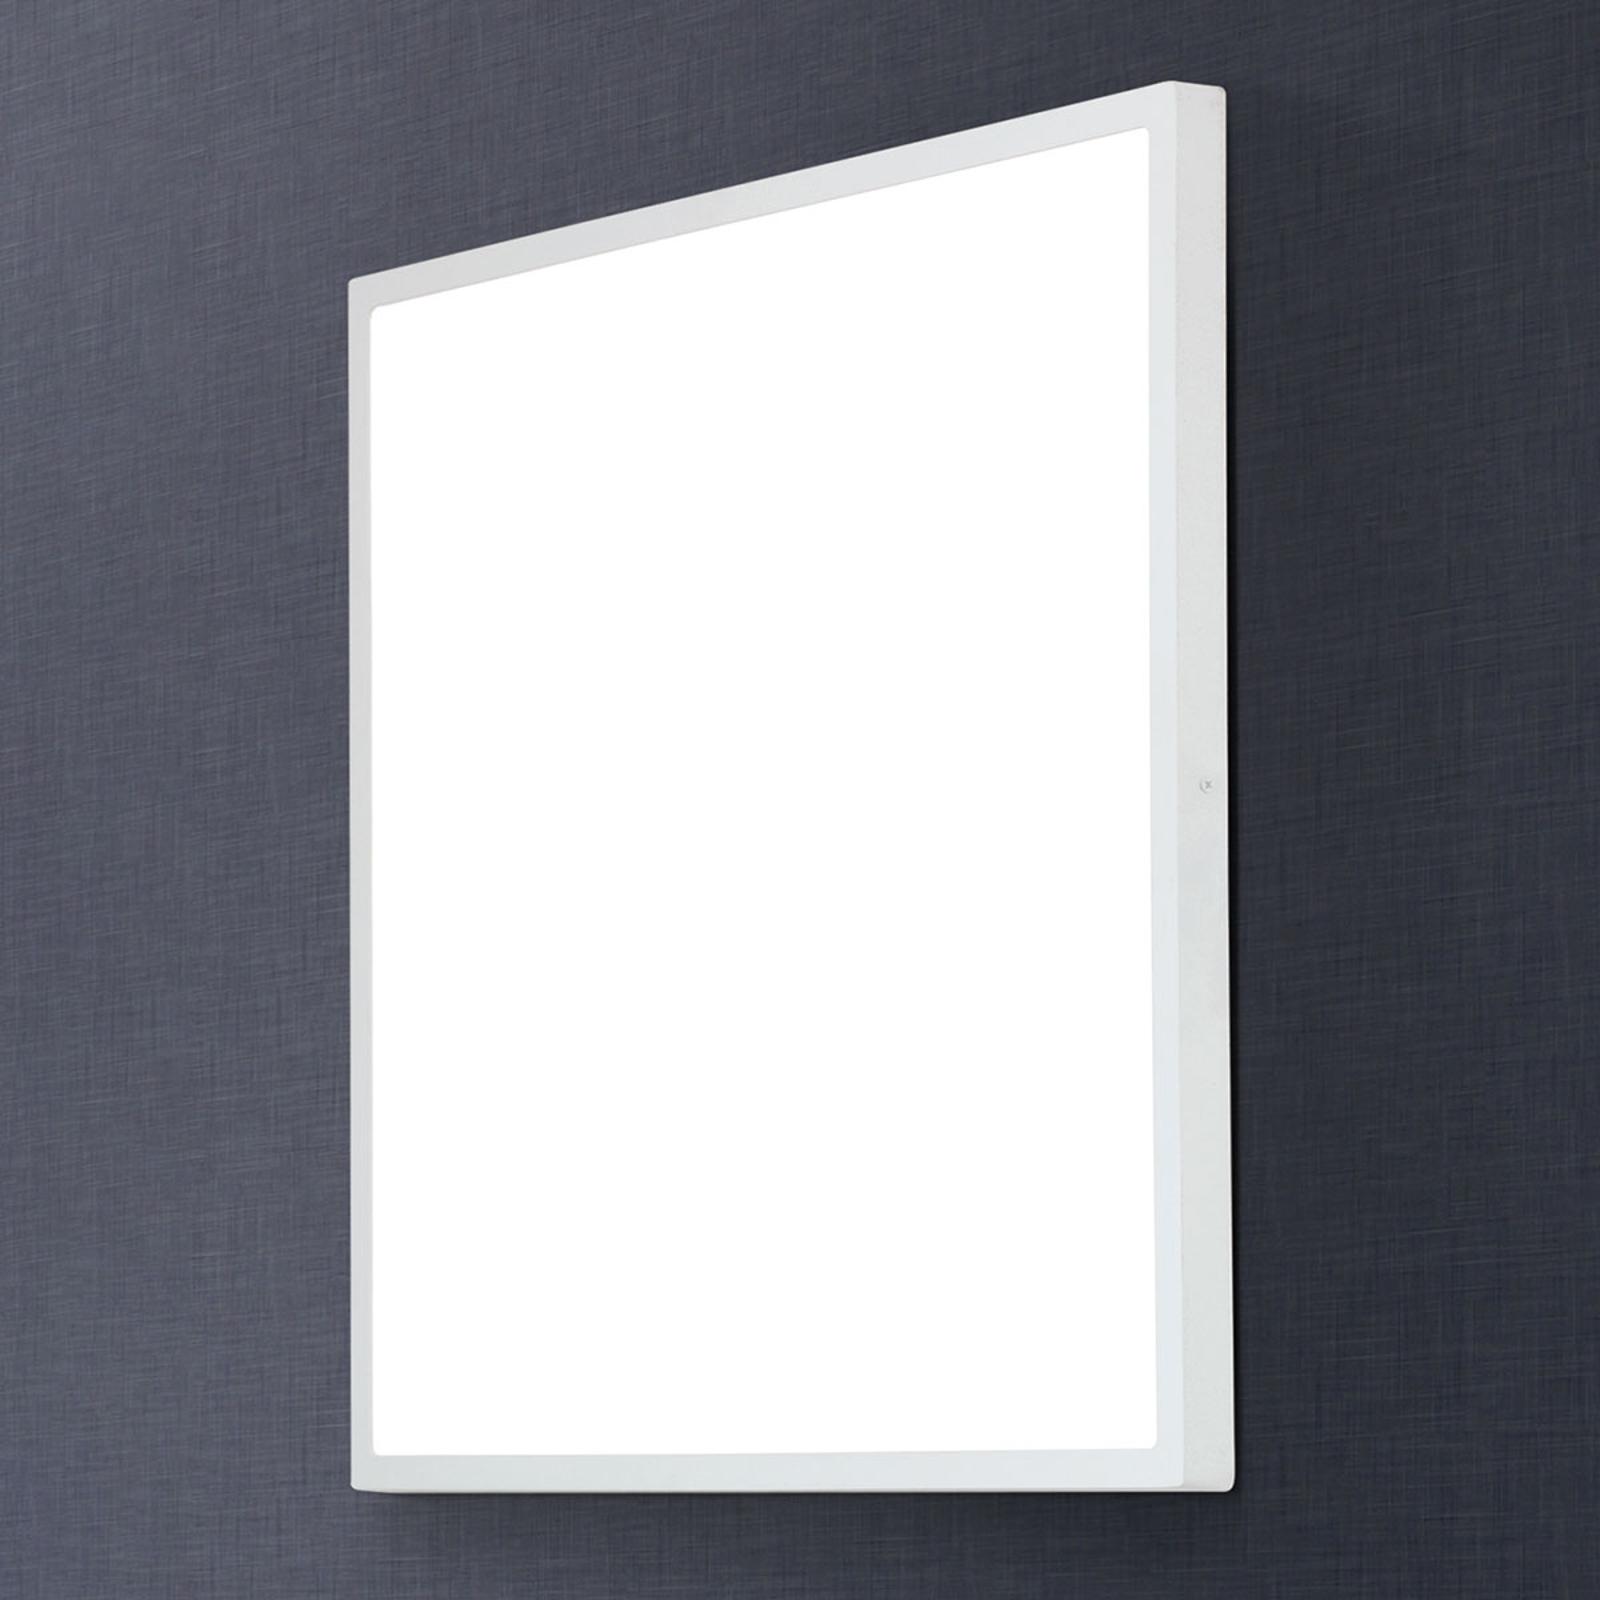 Hoekige LED plafondlamp Lero 60 x 60 cm